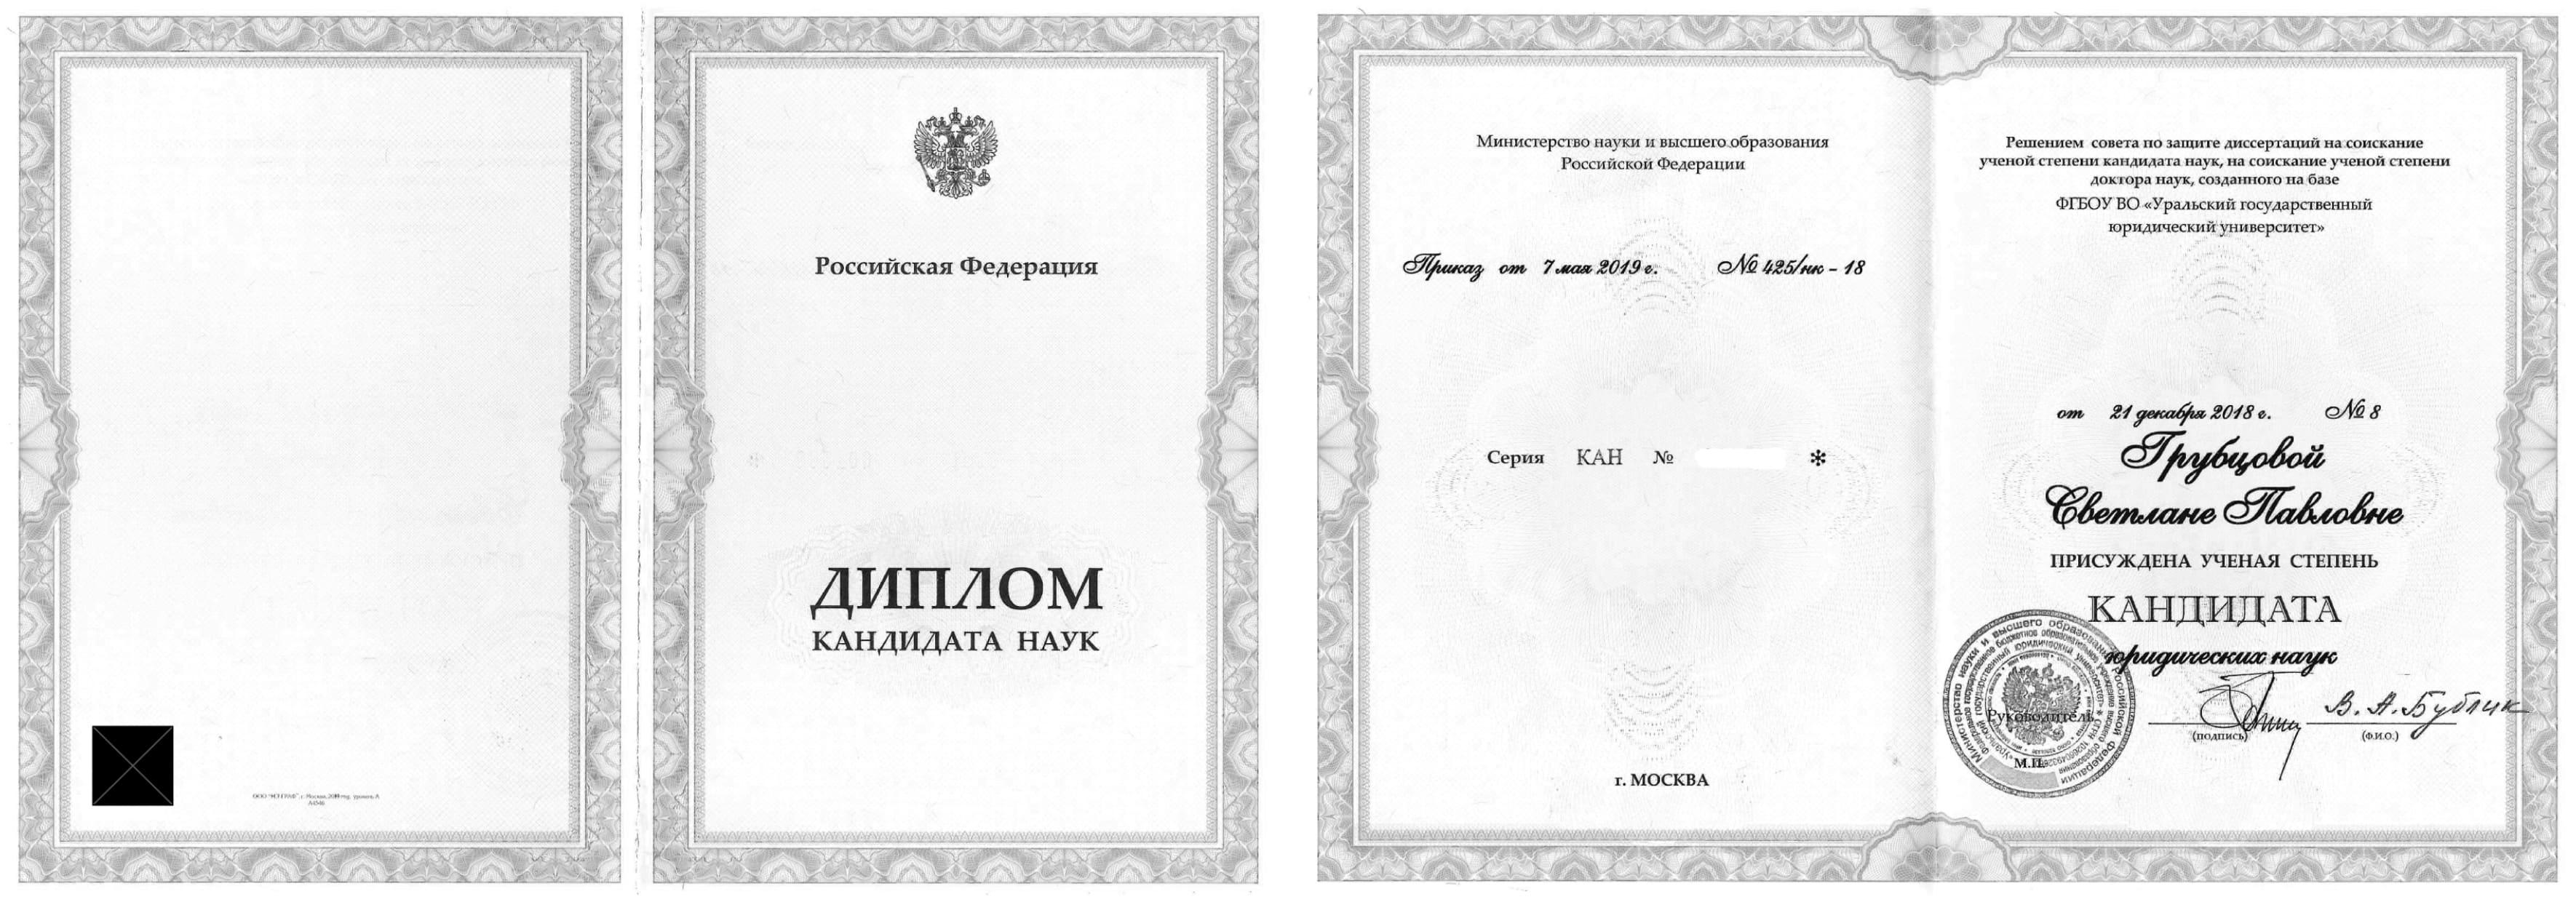 Грубцова Светлана Павловна — юрист, эксперт журнала COLADY